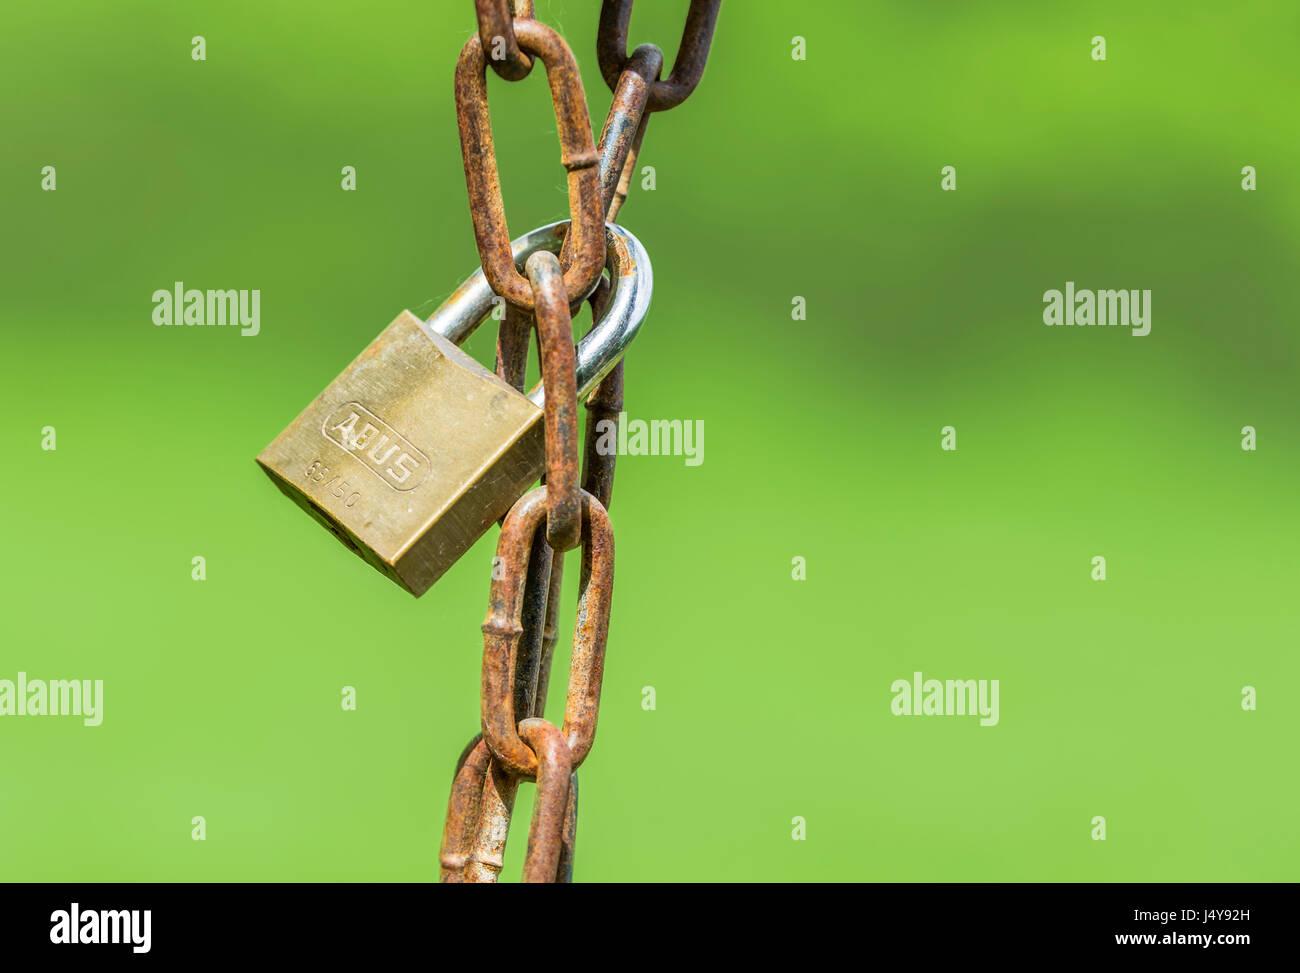 Locked concept. Locked padlock around a rusty chain. - Stock Image